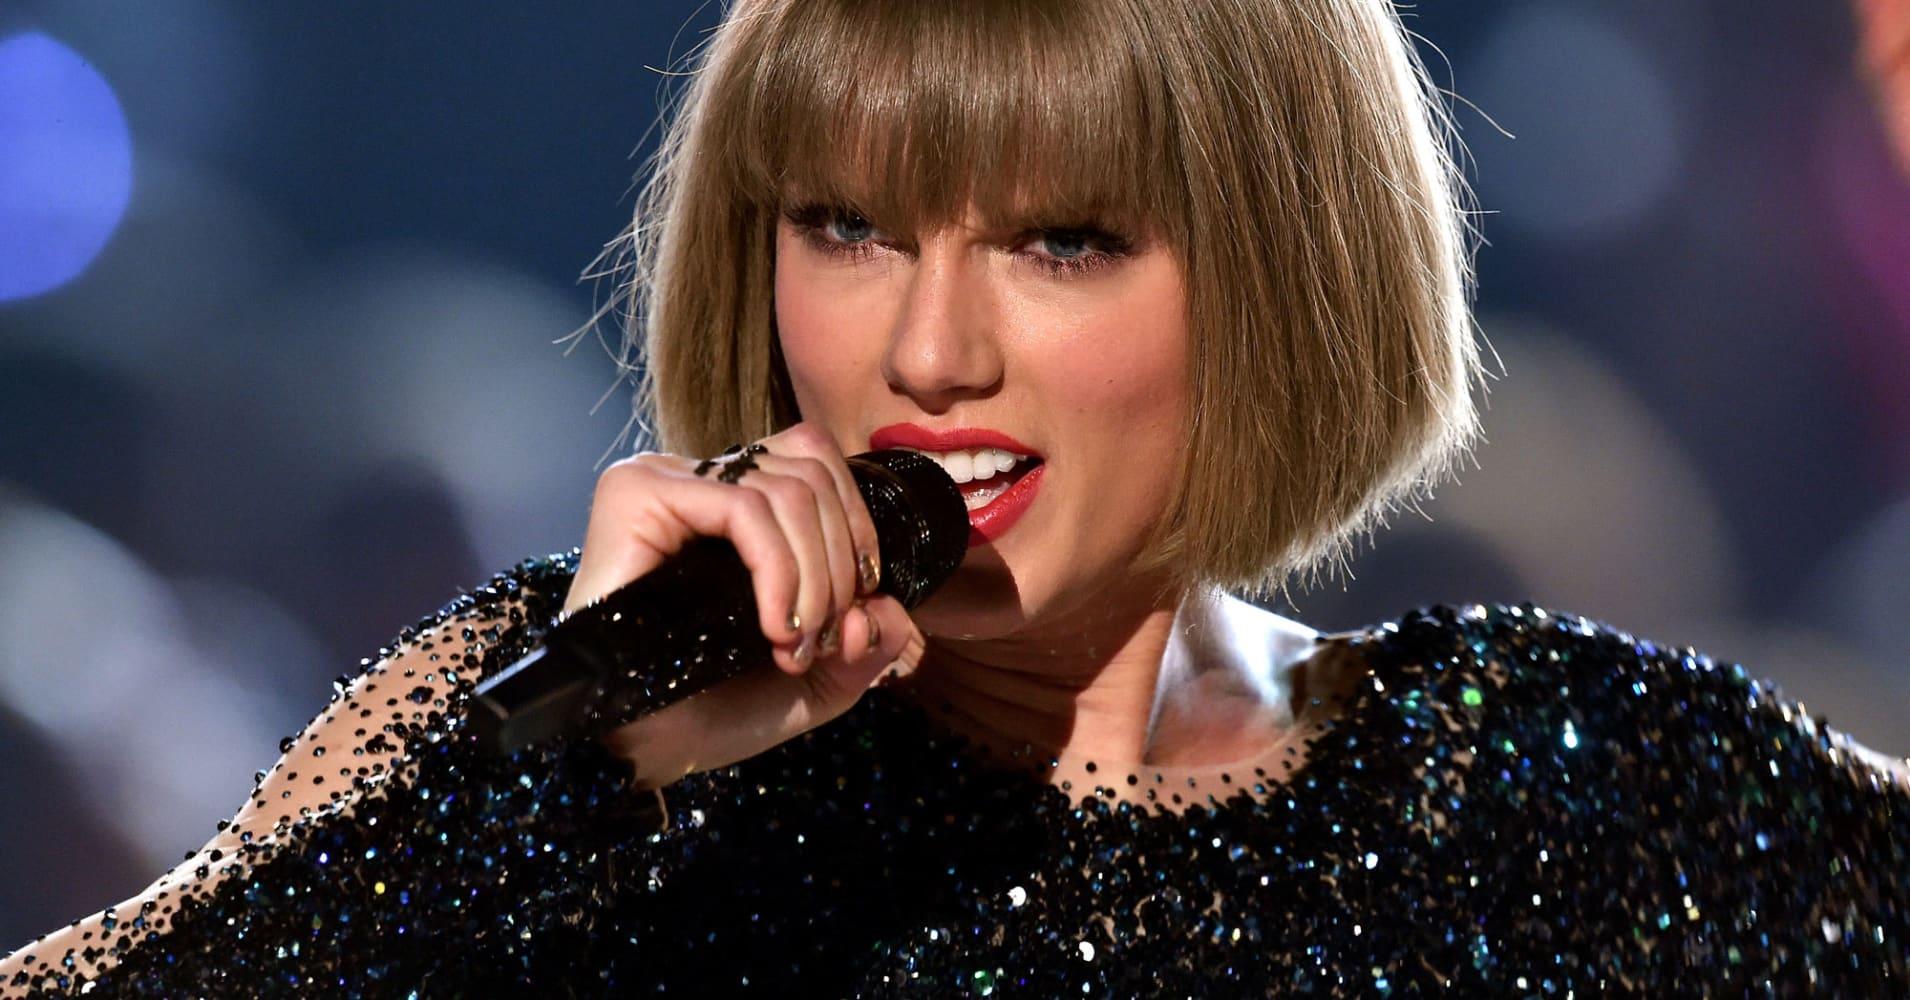 Voter registrations skyrocket after Taylor Swift's get-out-the-vote push